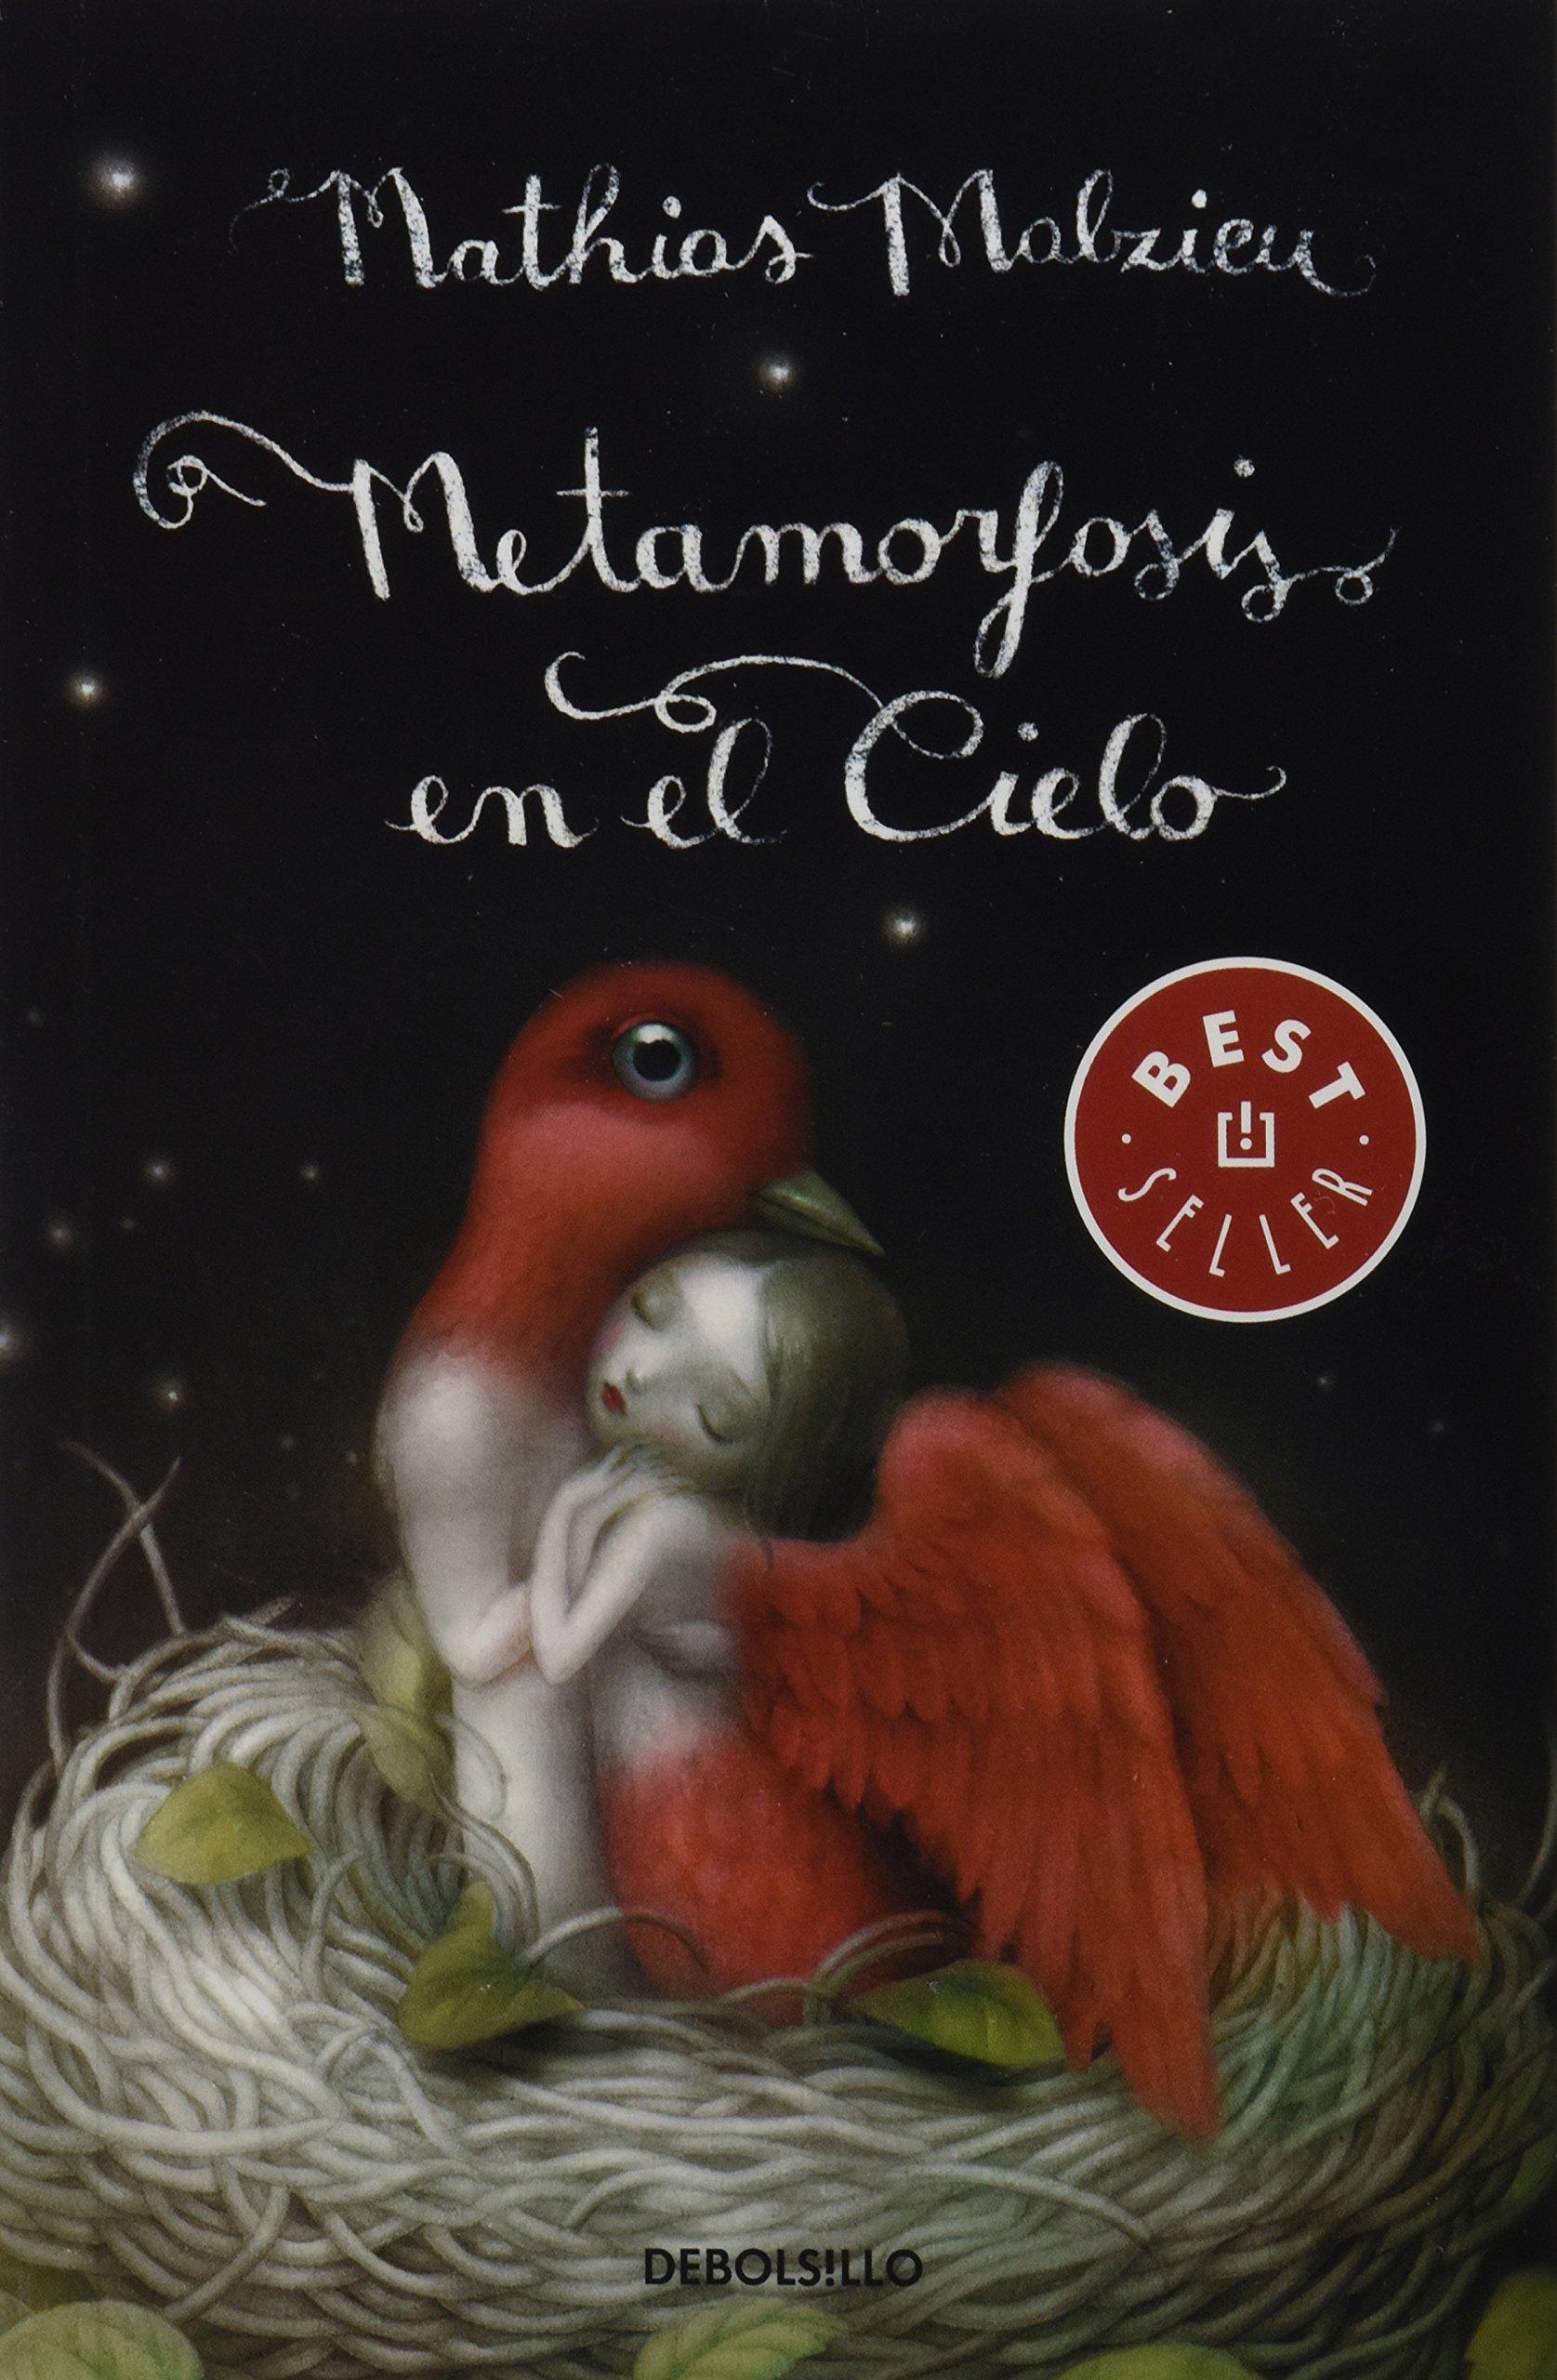 Amazon.com: Metamorfosis en el cielo (Spanish Edition) (9786073120333): Mathias Malzieu: Books